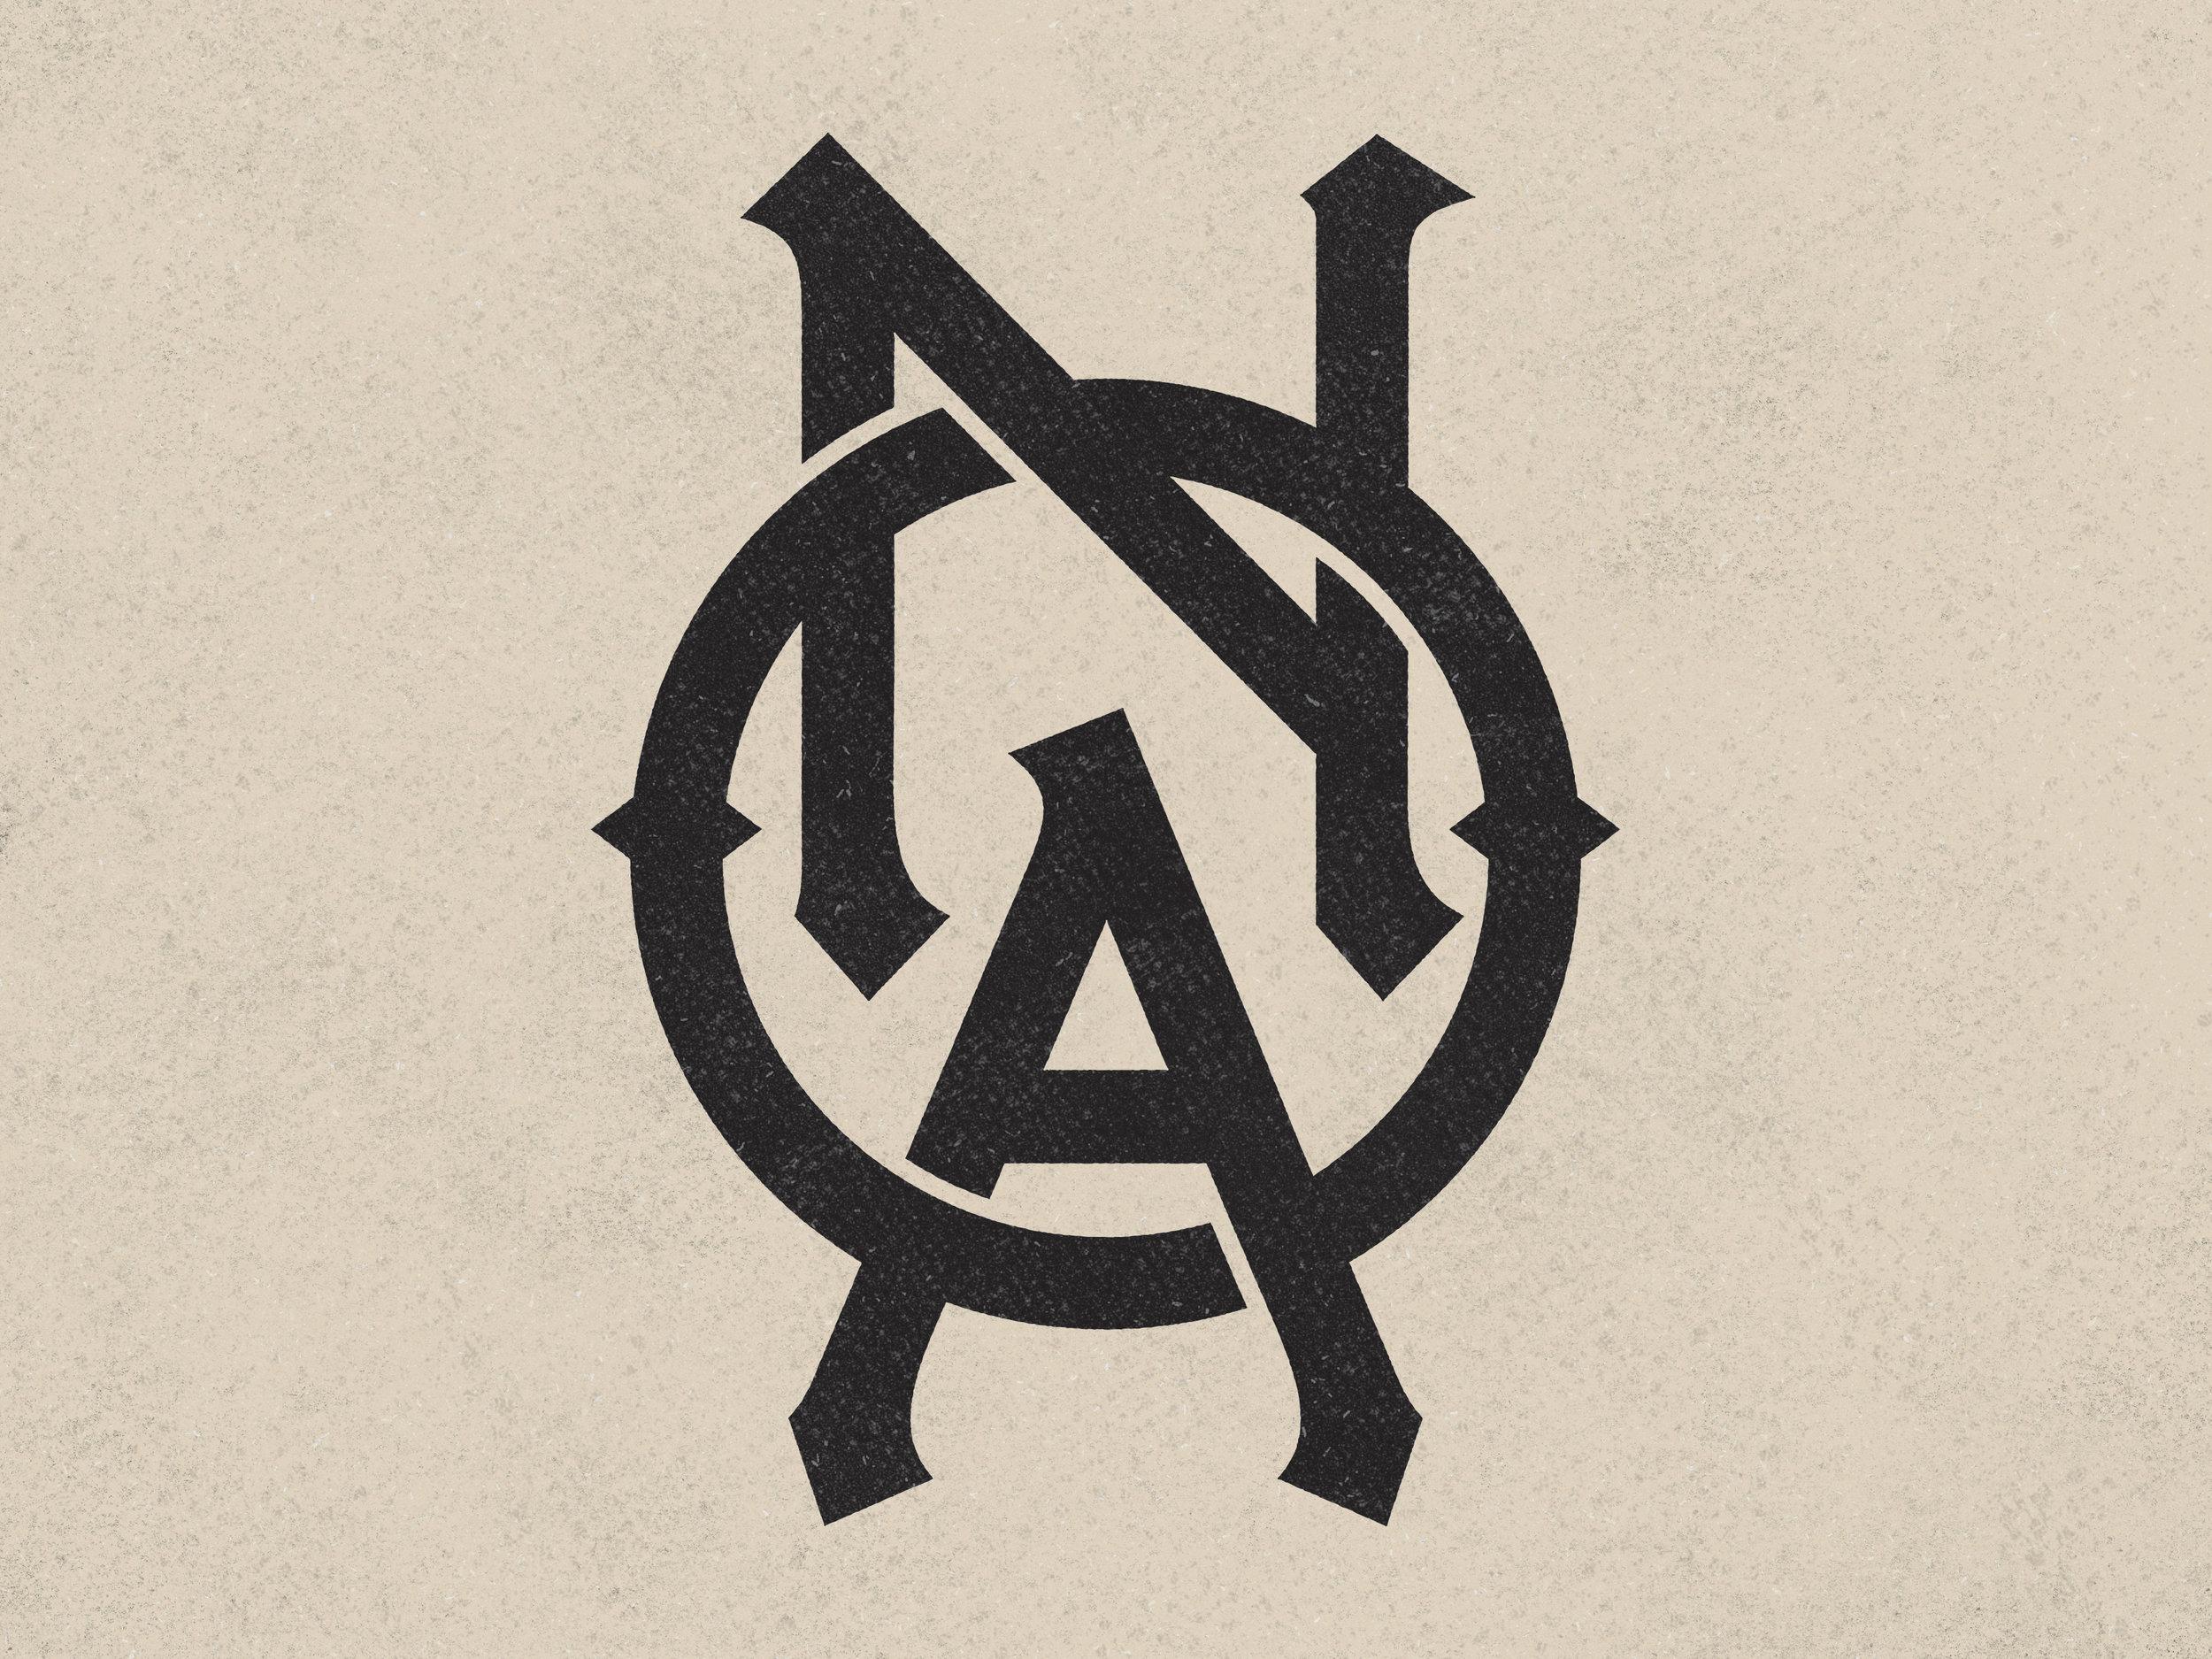 New Age Outlaws - Monogram (April - 02 - 2018).jpg